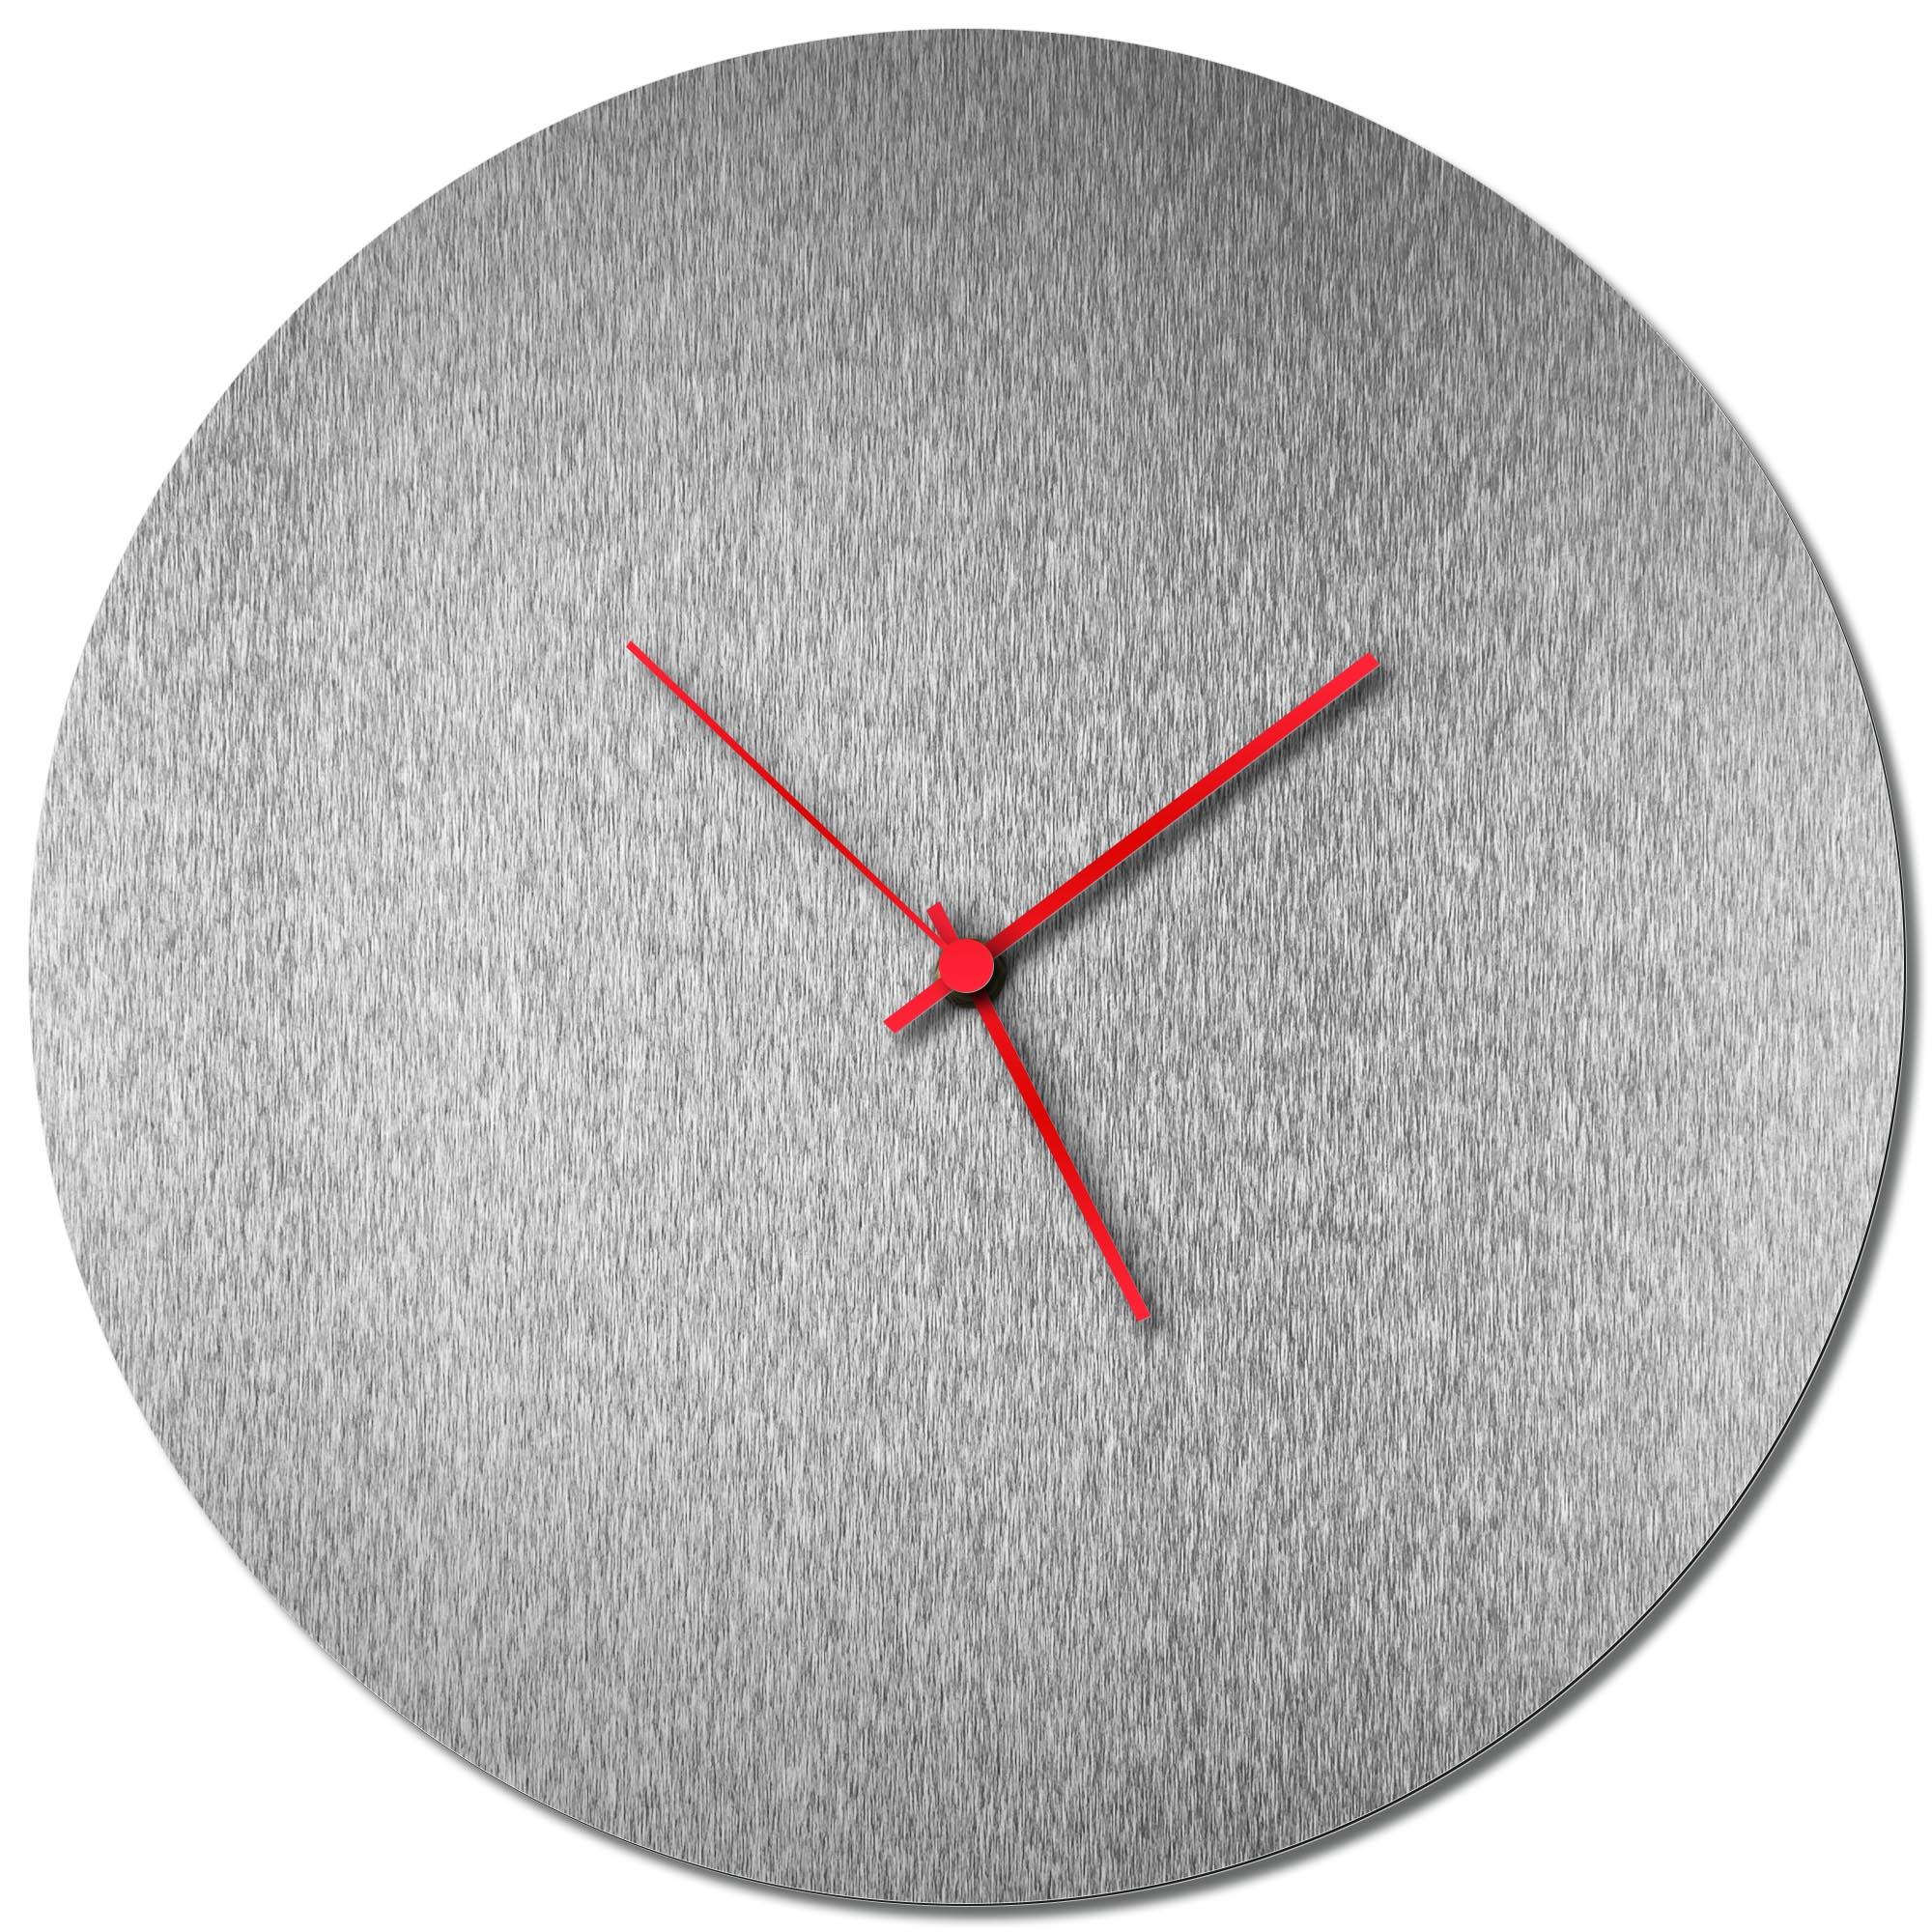 Adam Schwoeppe 'Silversmith Circle Clock Large Red' Midcentury Modern Style Wall Clock